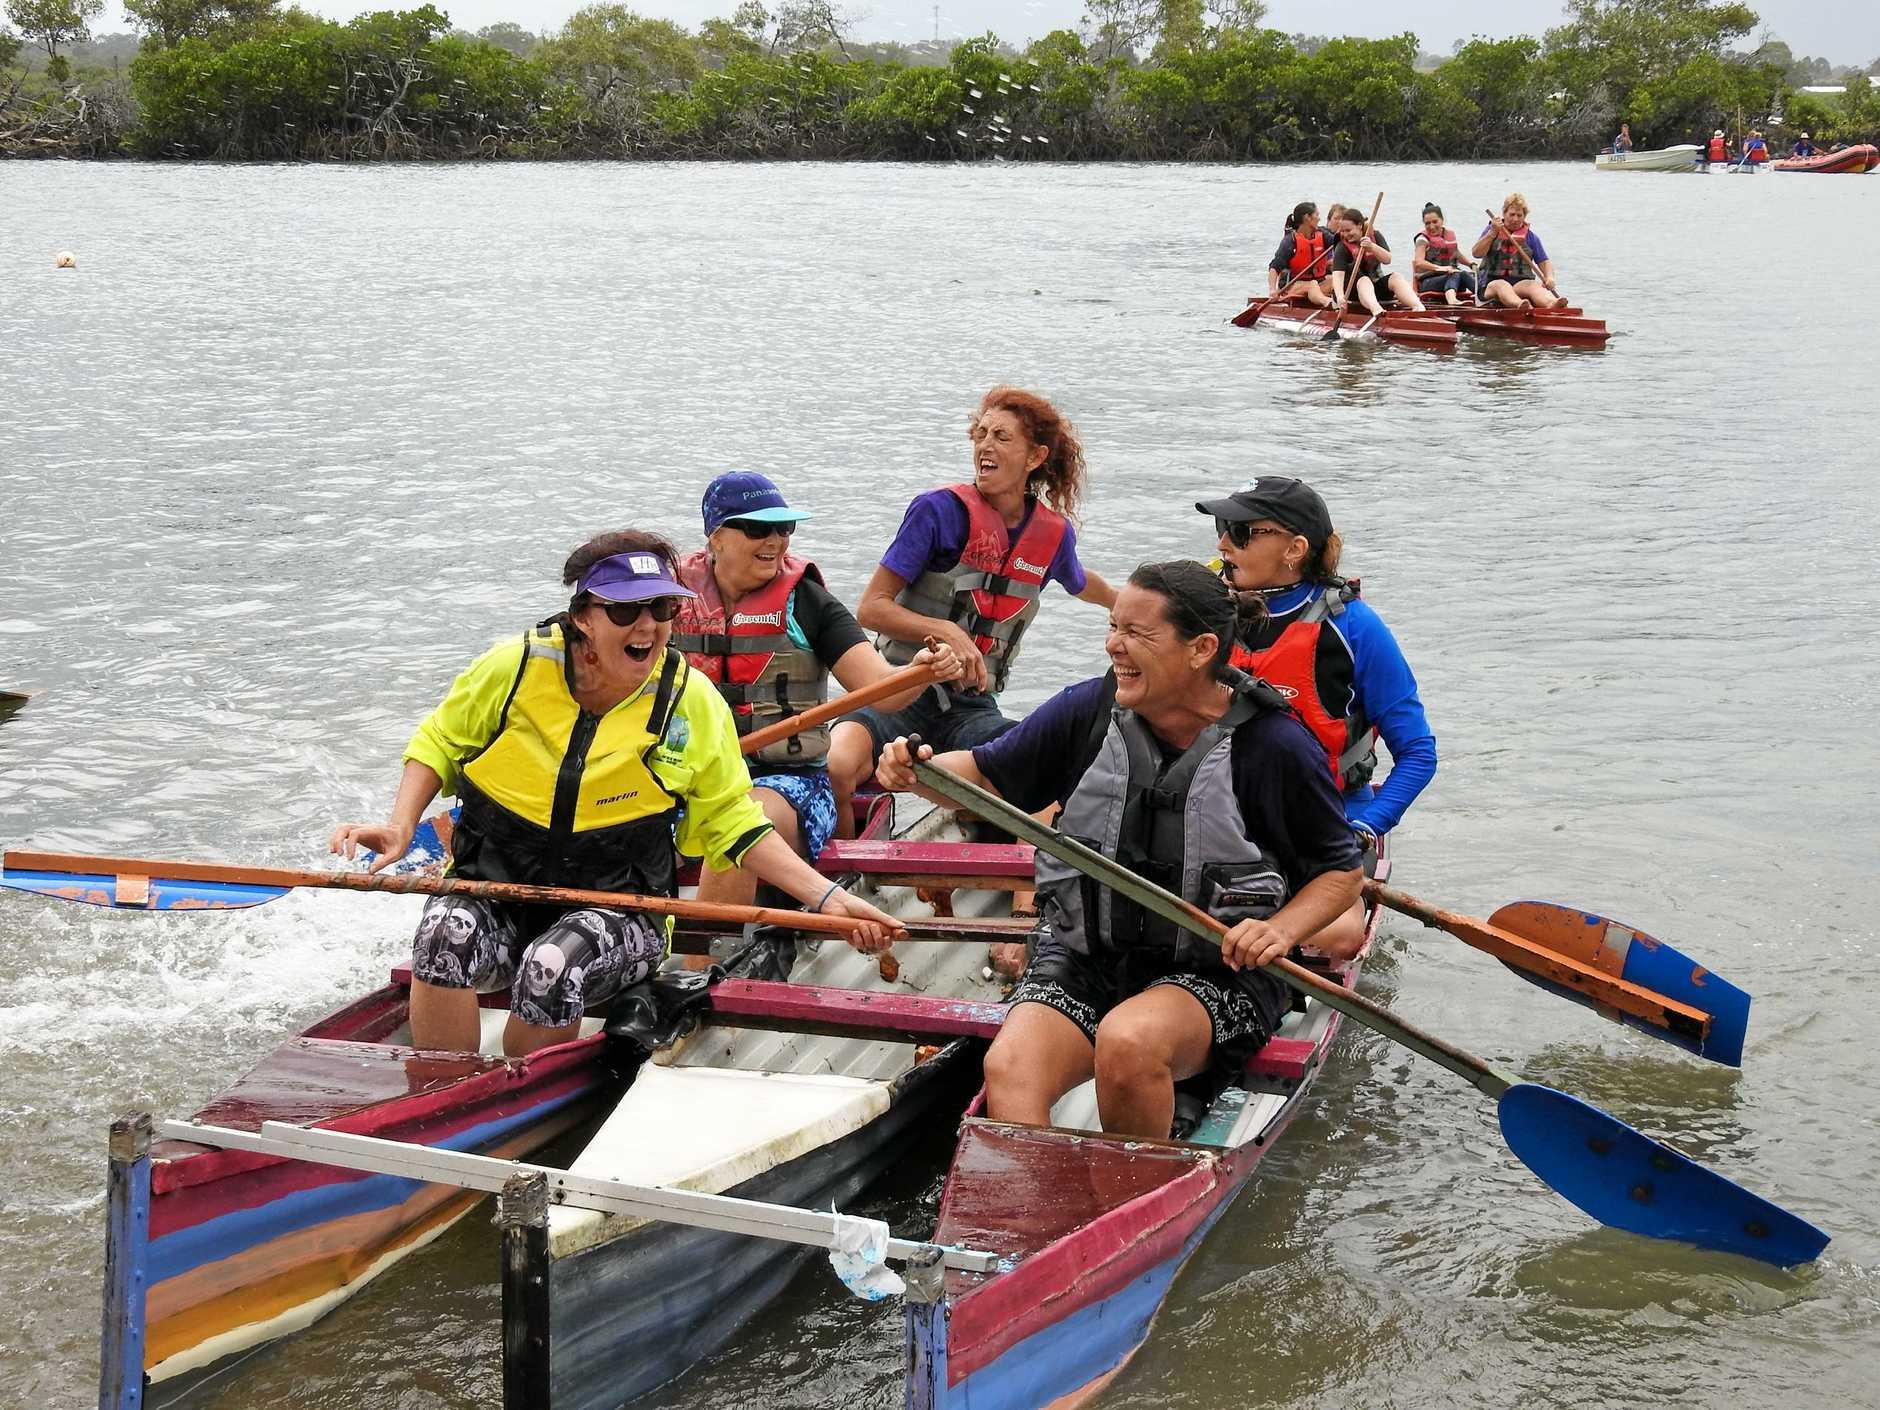 CLOSE FINISH: The ladies go head to head at Baffle Creek